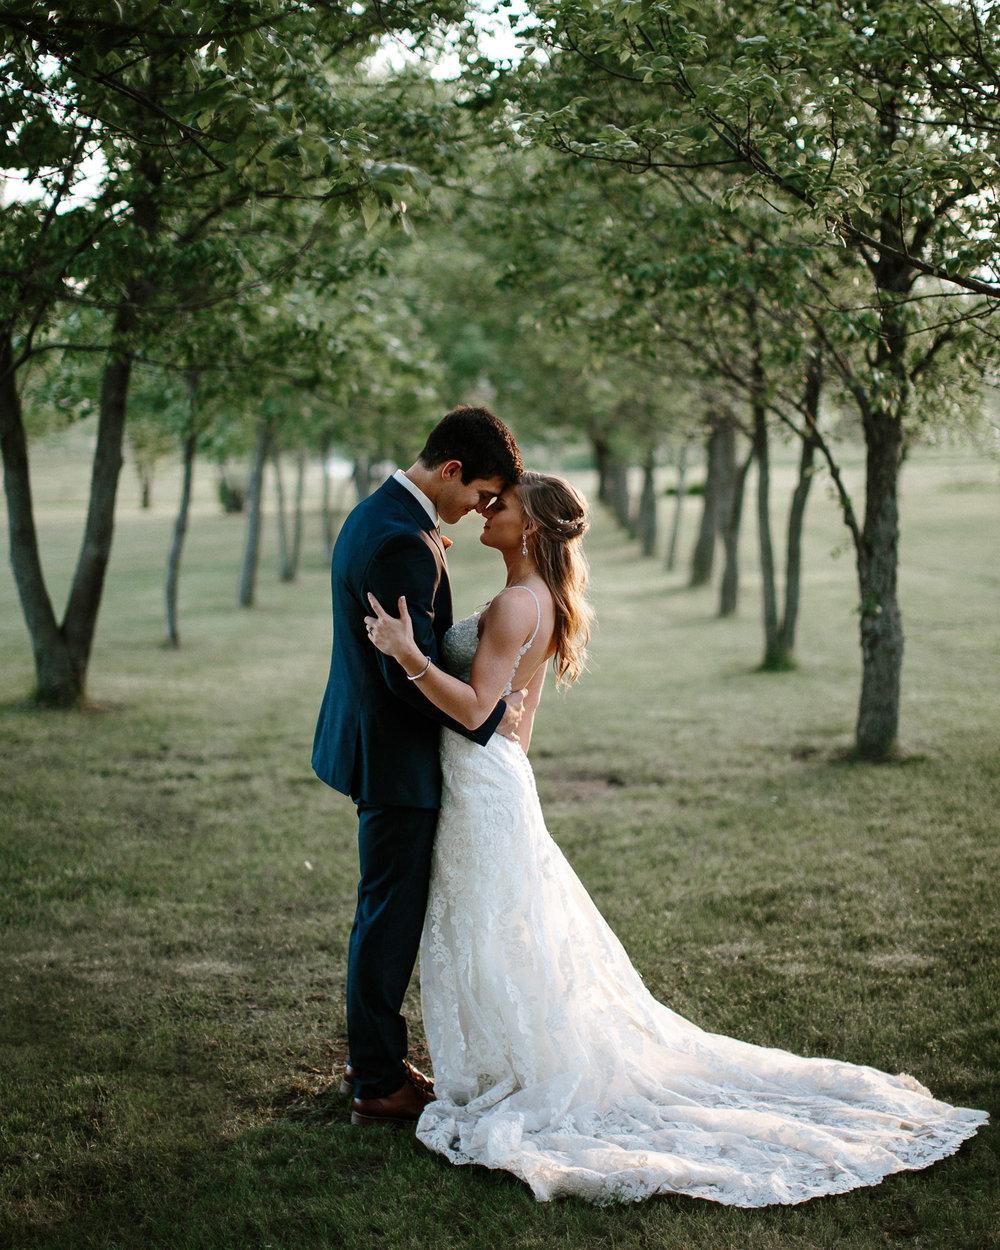 wedding-elopement-adventerous-romantic-timeless-south-dakota-blue-haven-barn-077.jpg